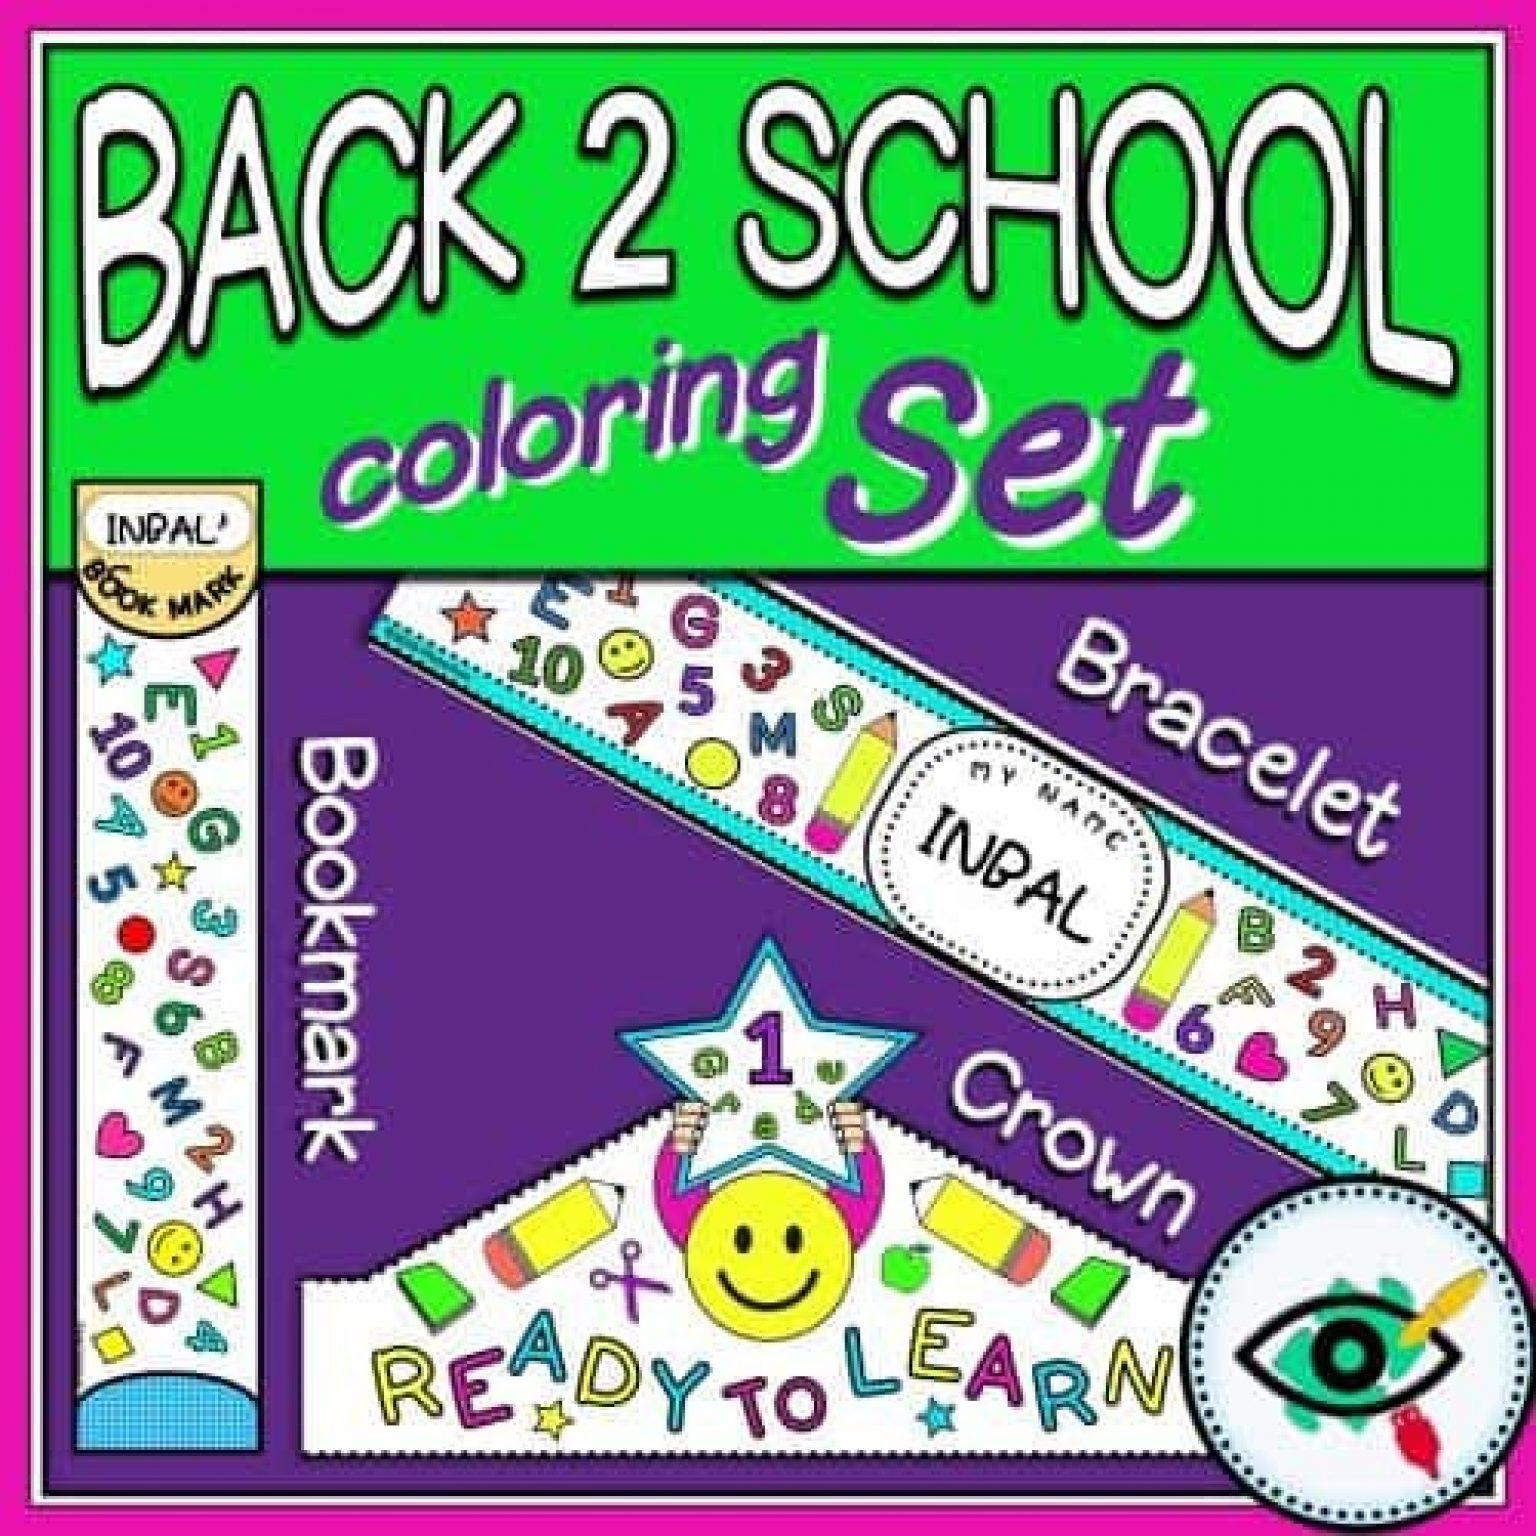 seasonal-bts-coloring-set-g1-2-title